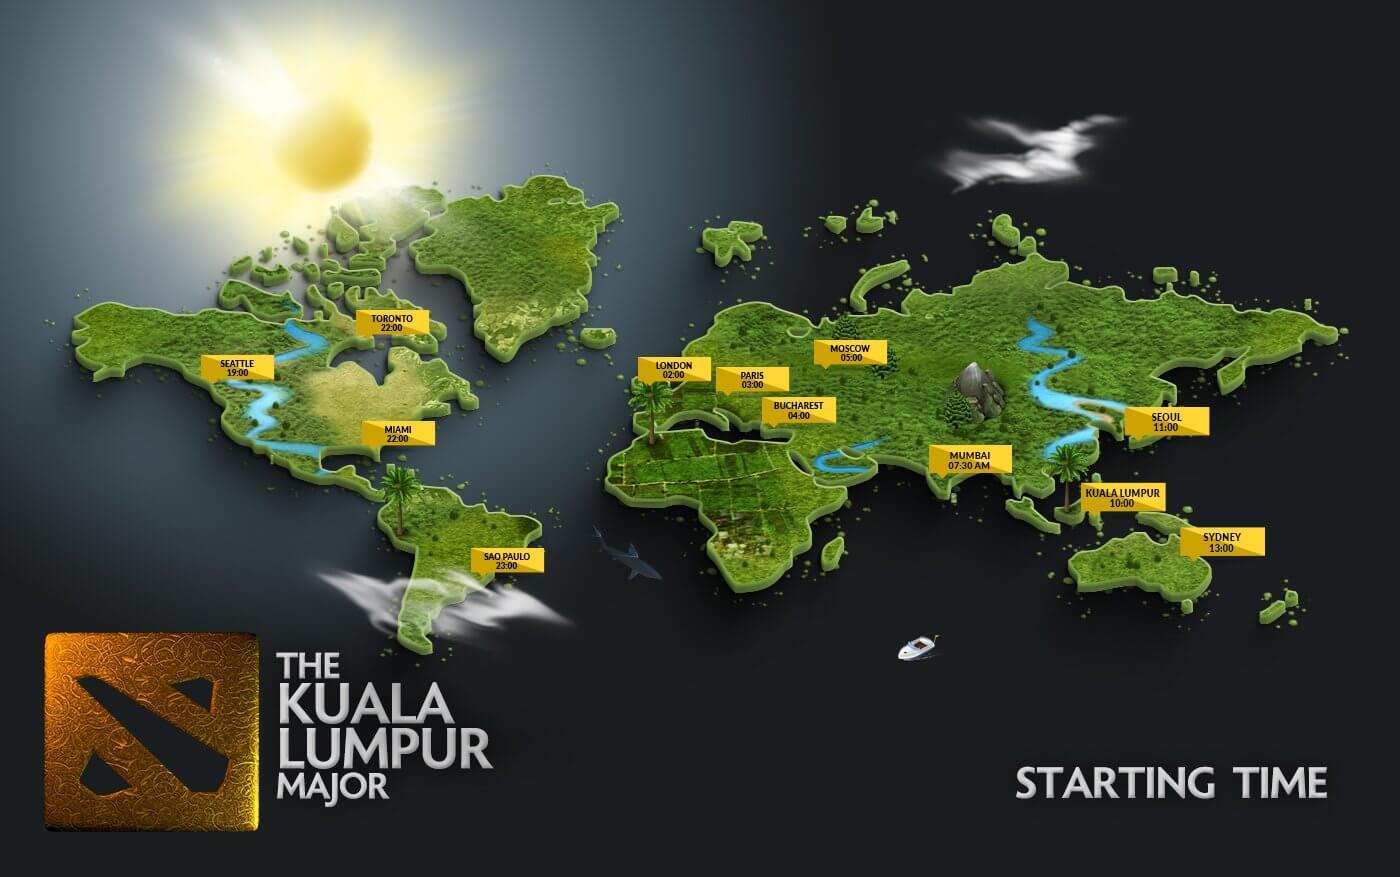 Starting Time - The Kuala Lumpur Major - PGL